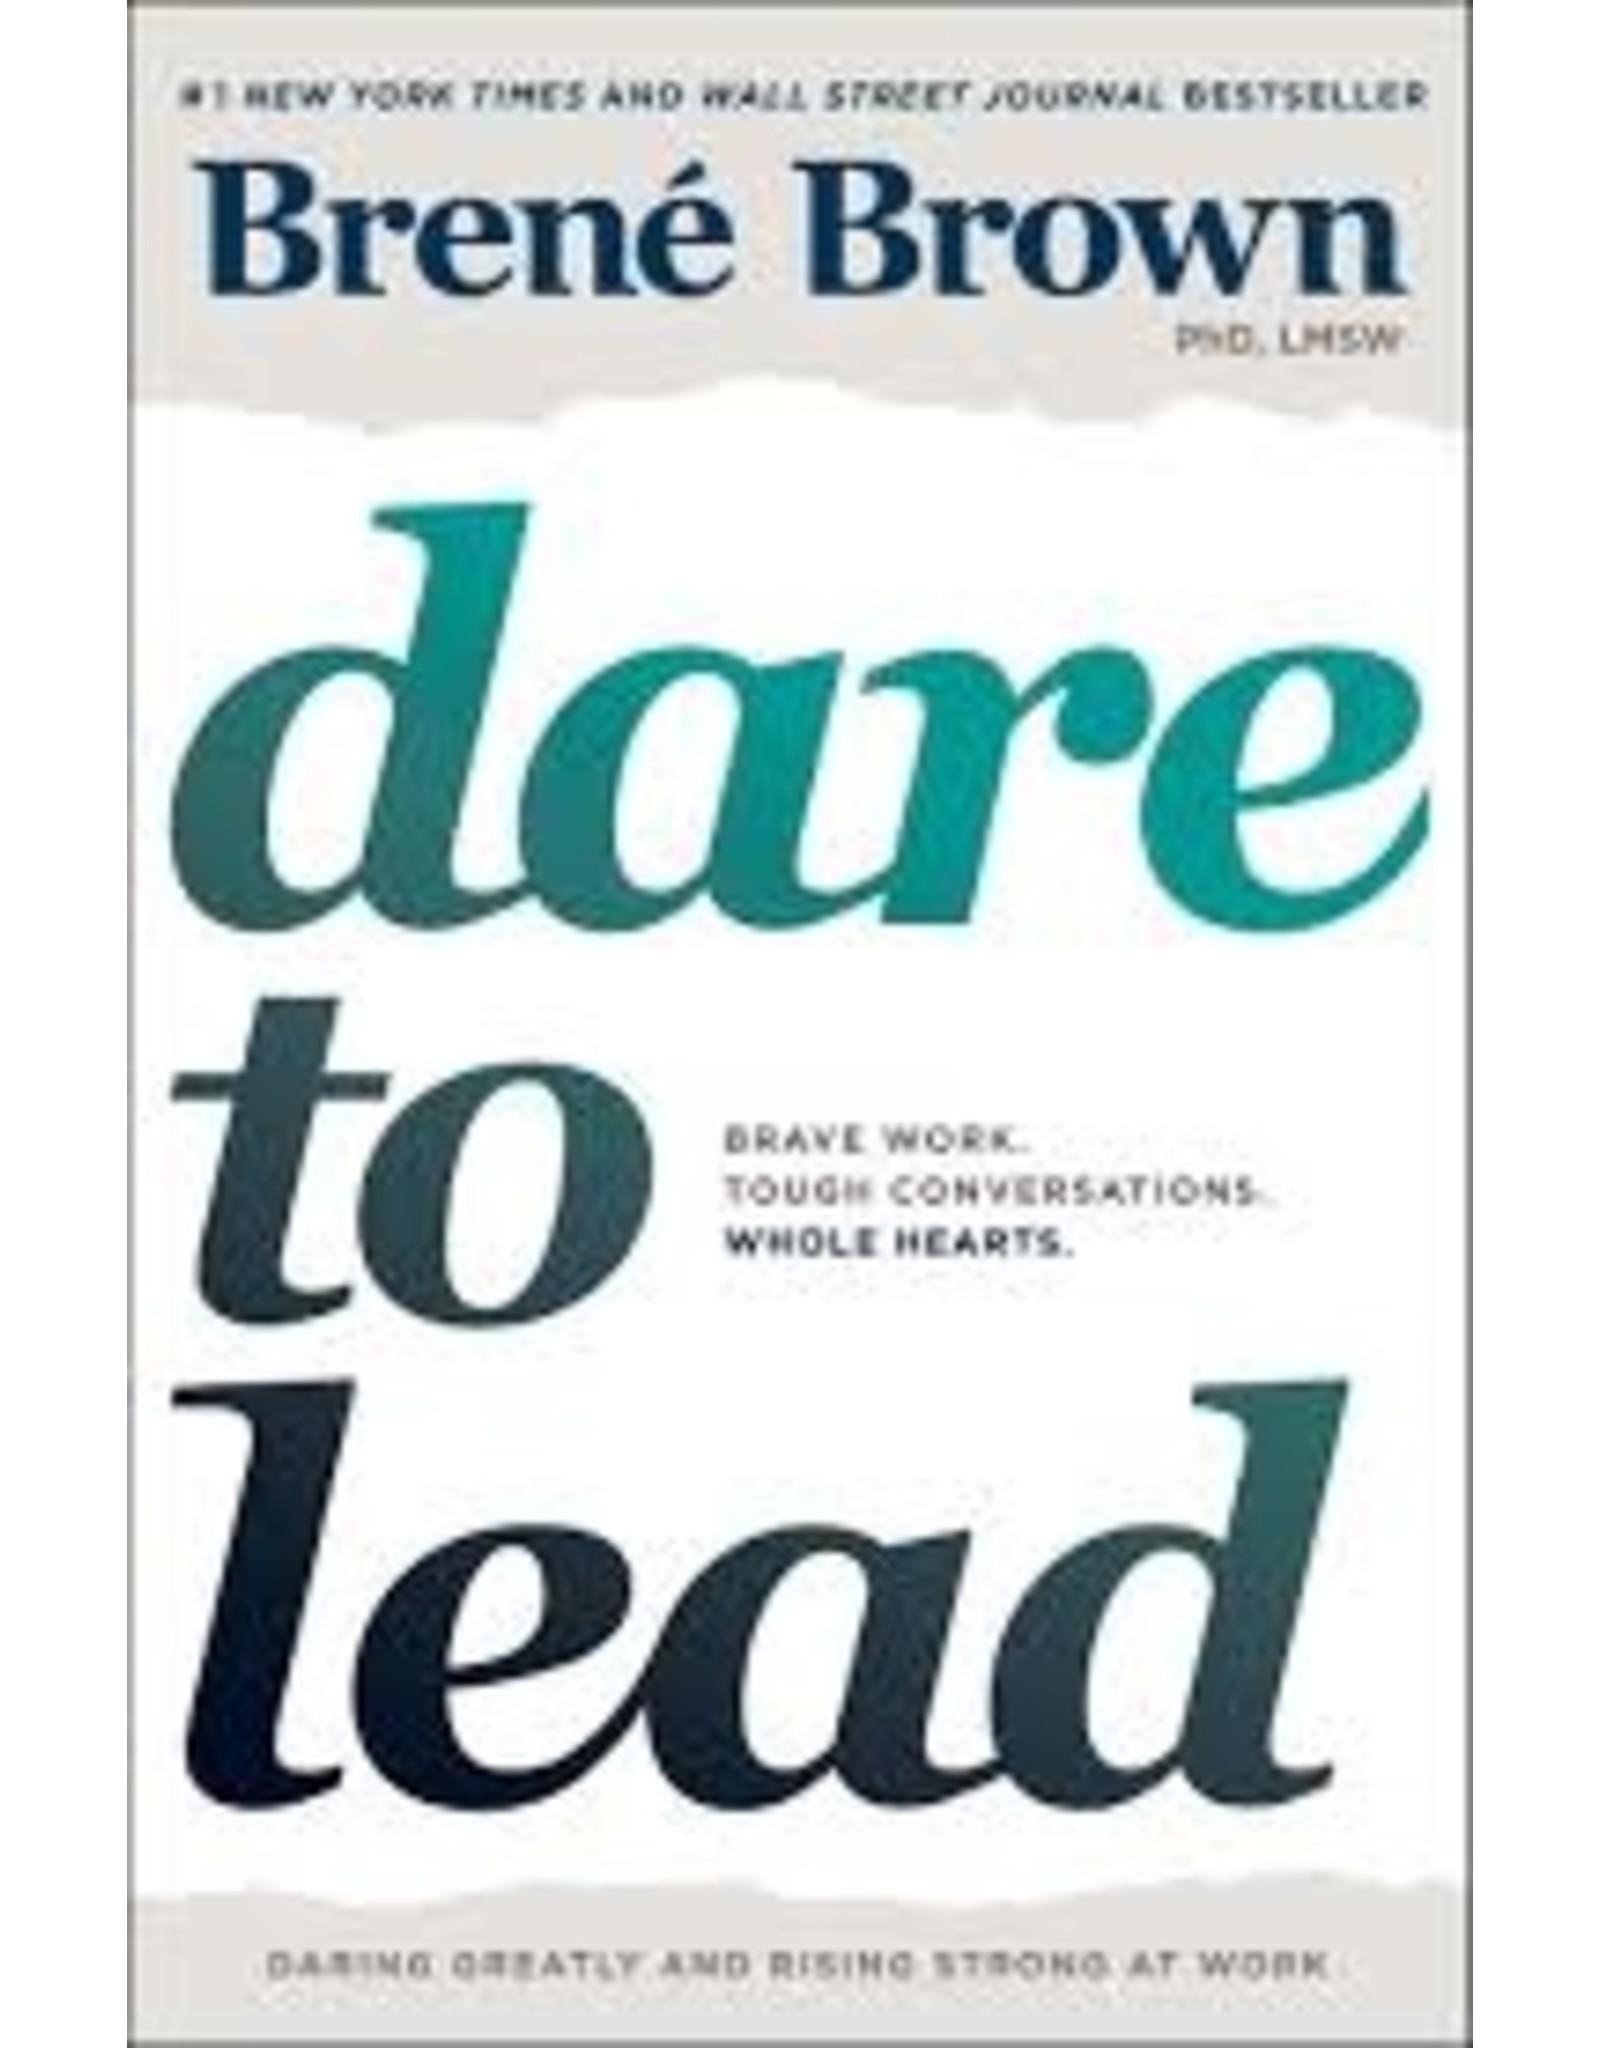 Books Dare to Lead by Brene Brown (Love Week)